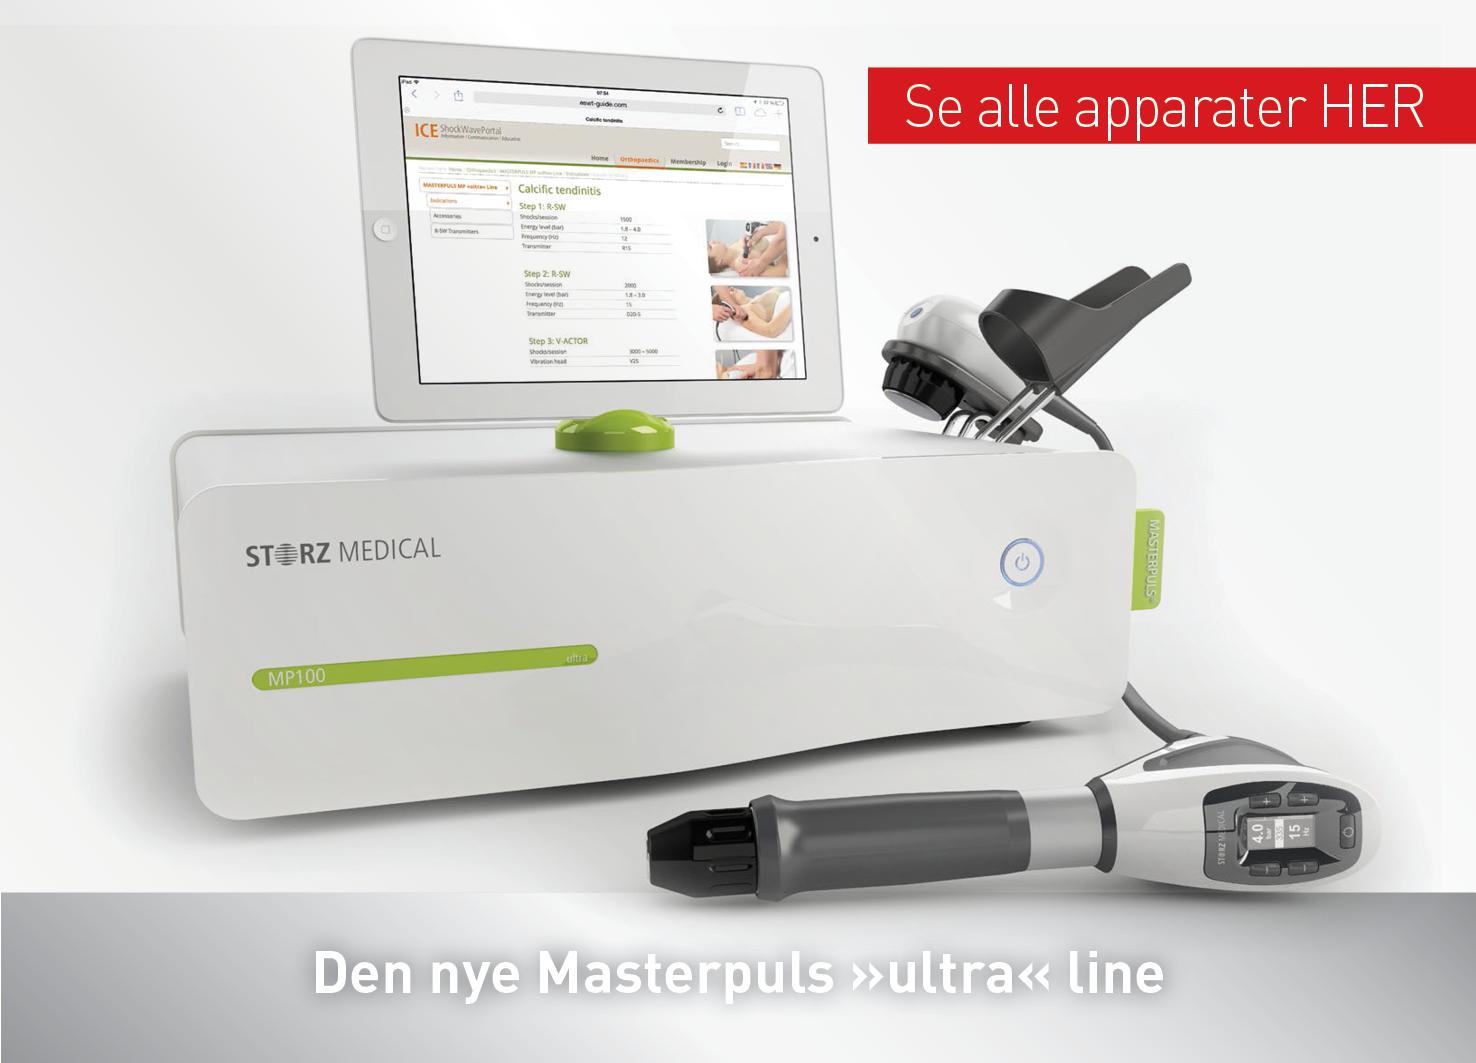 Masterpuls_ultra line_2